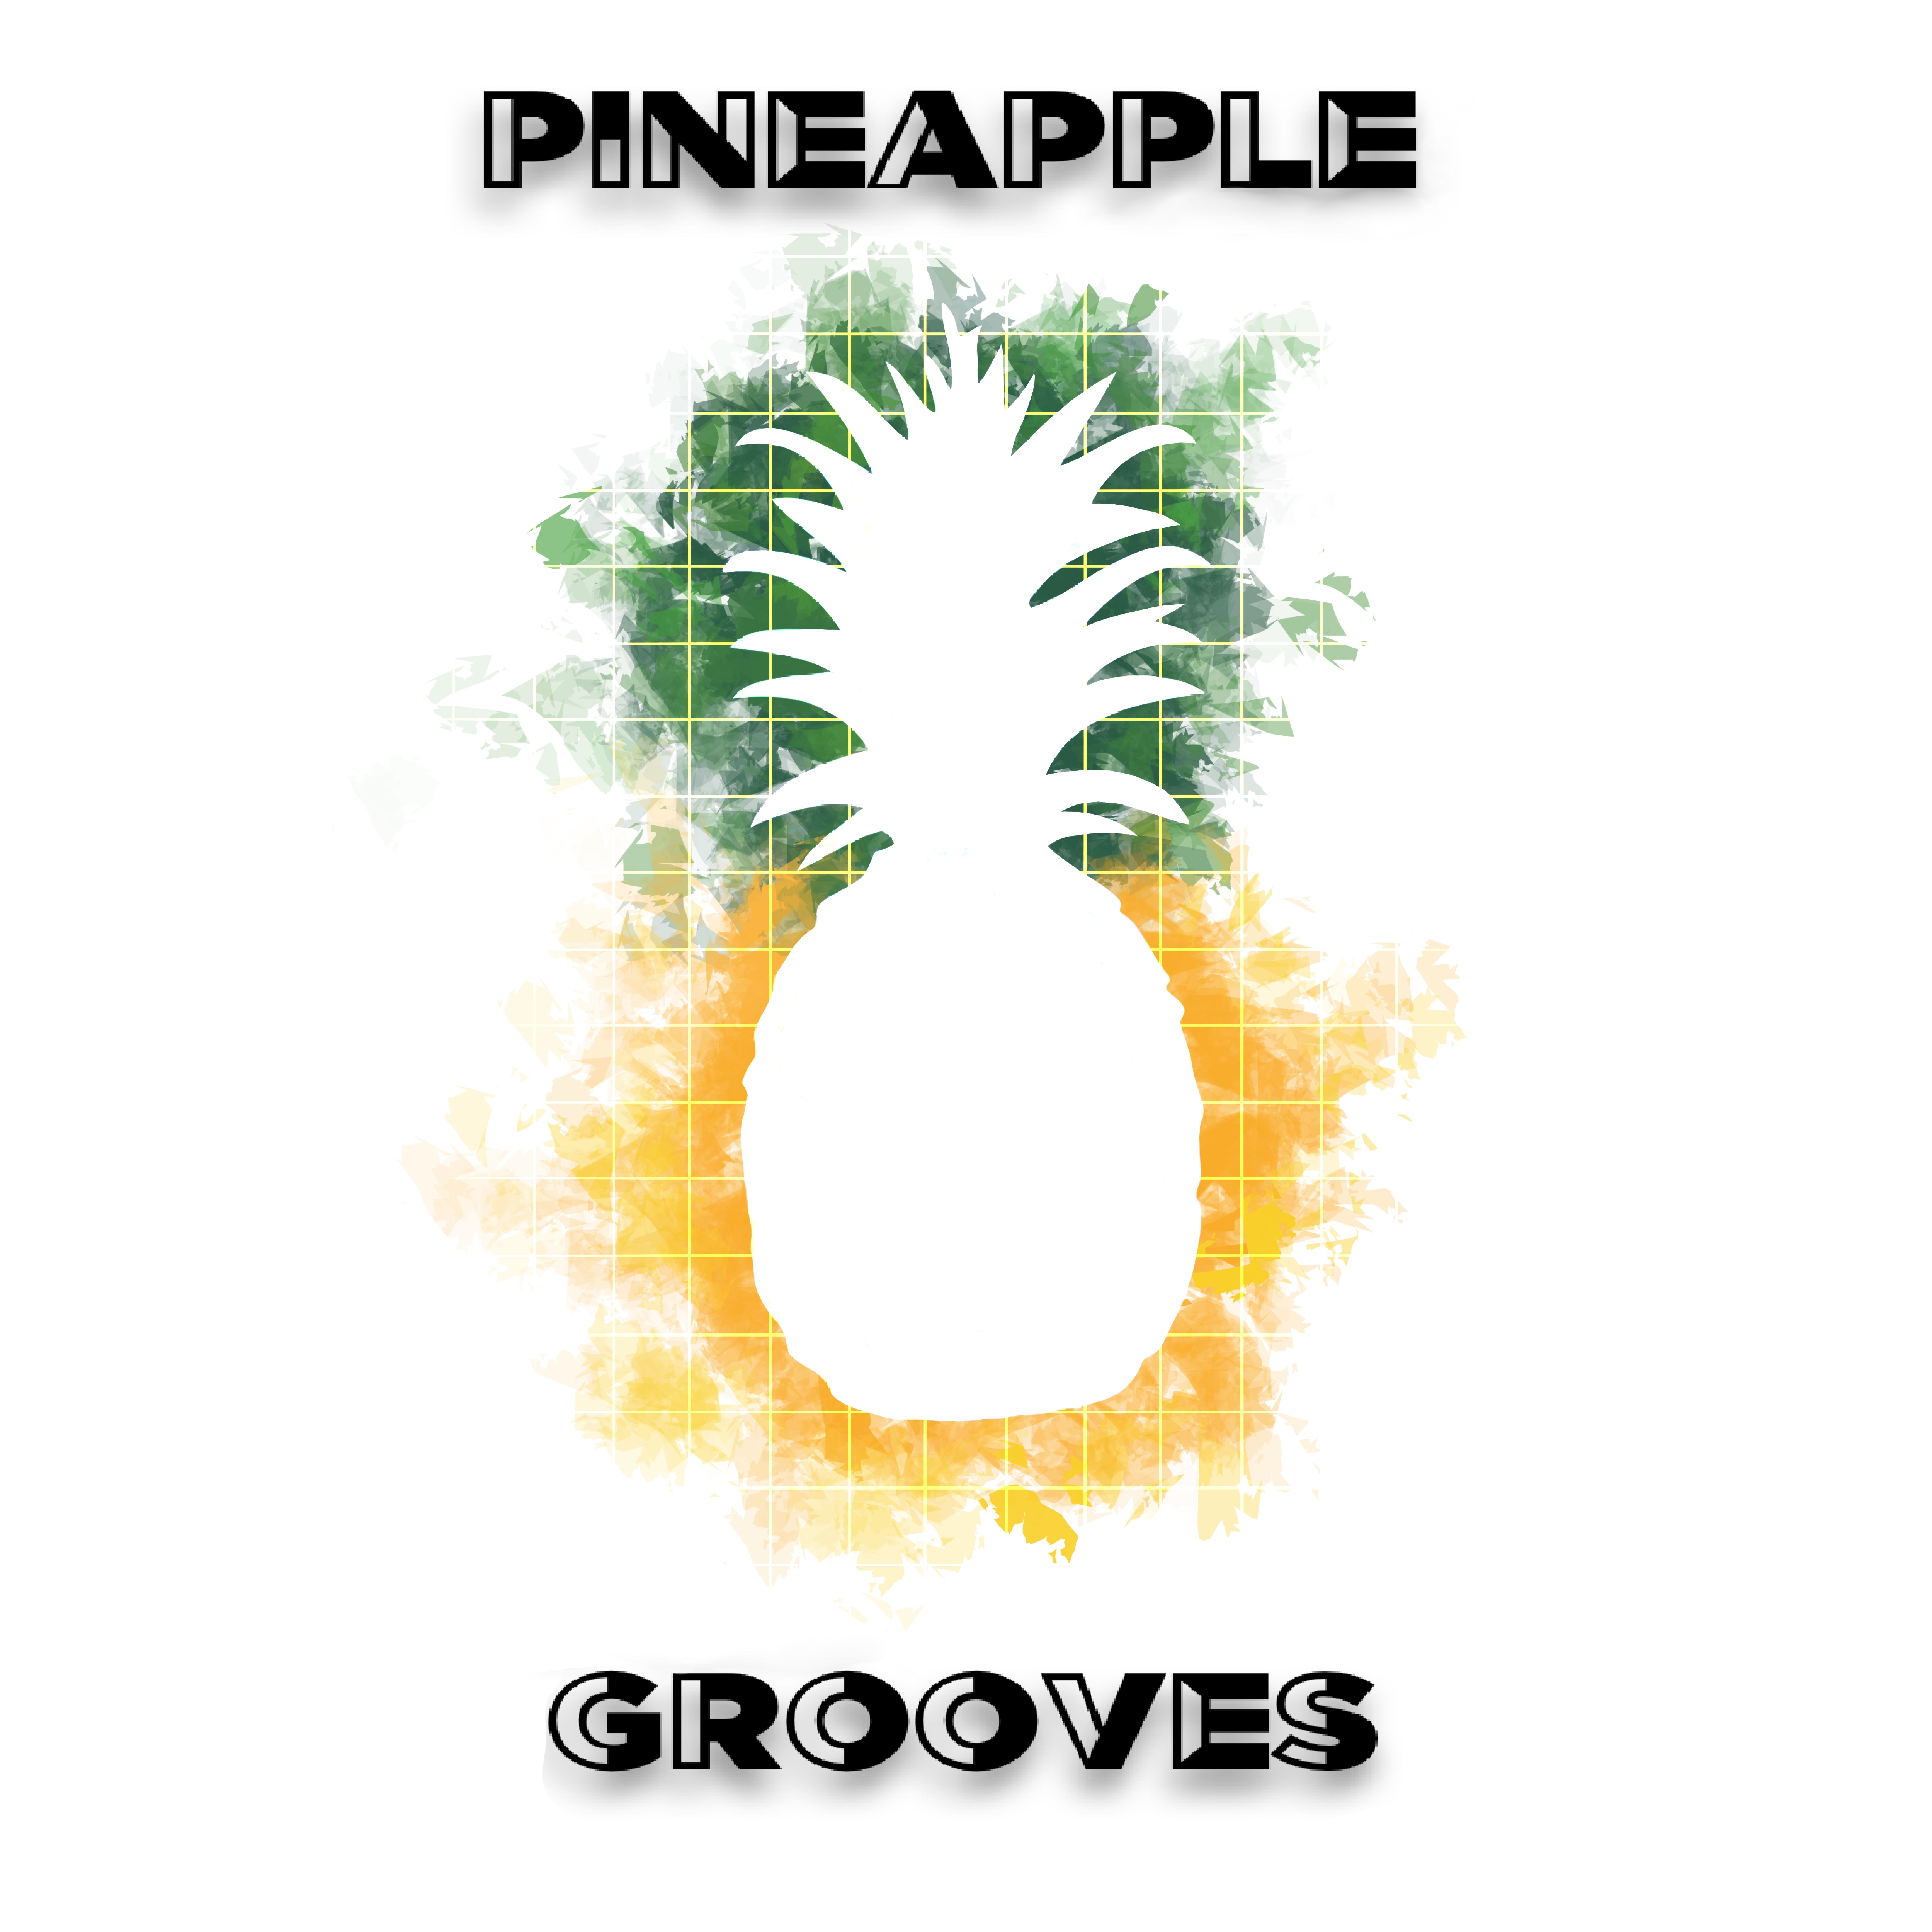 Pineapple Grooves